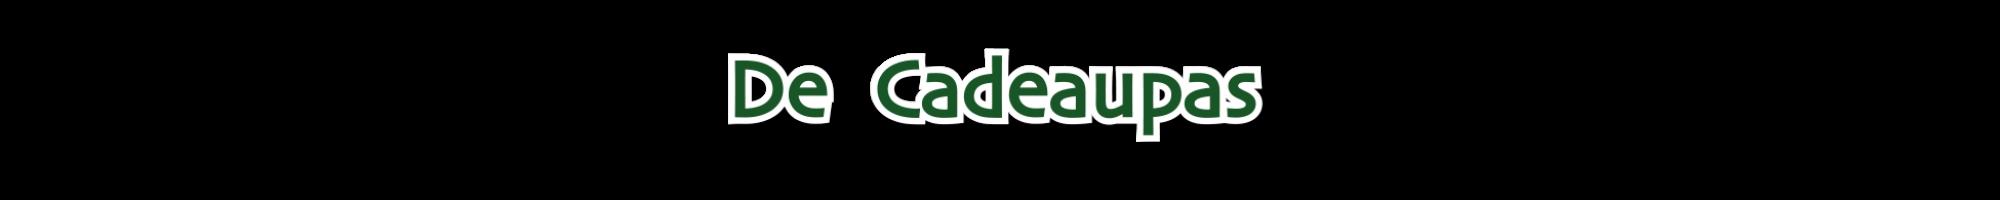 Titel_Cadeau